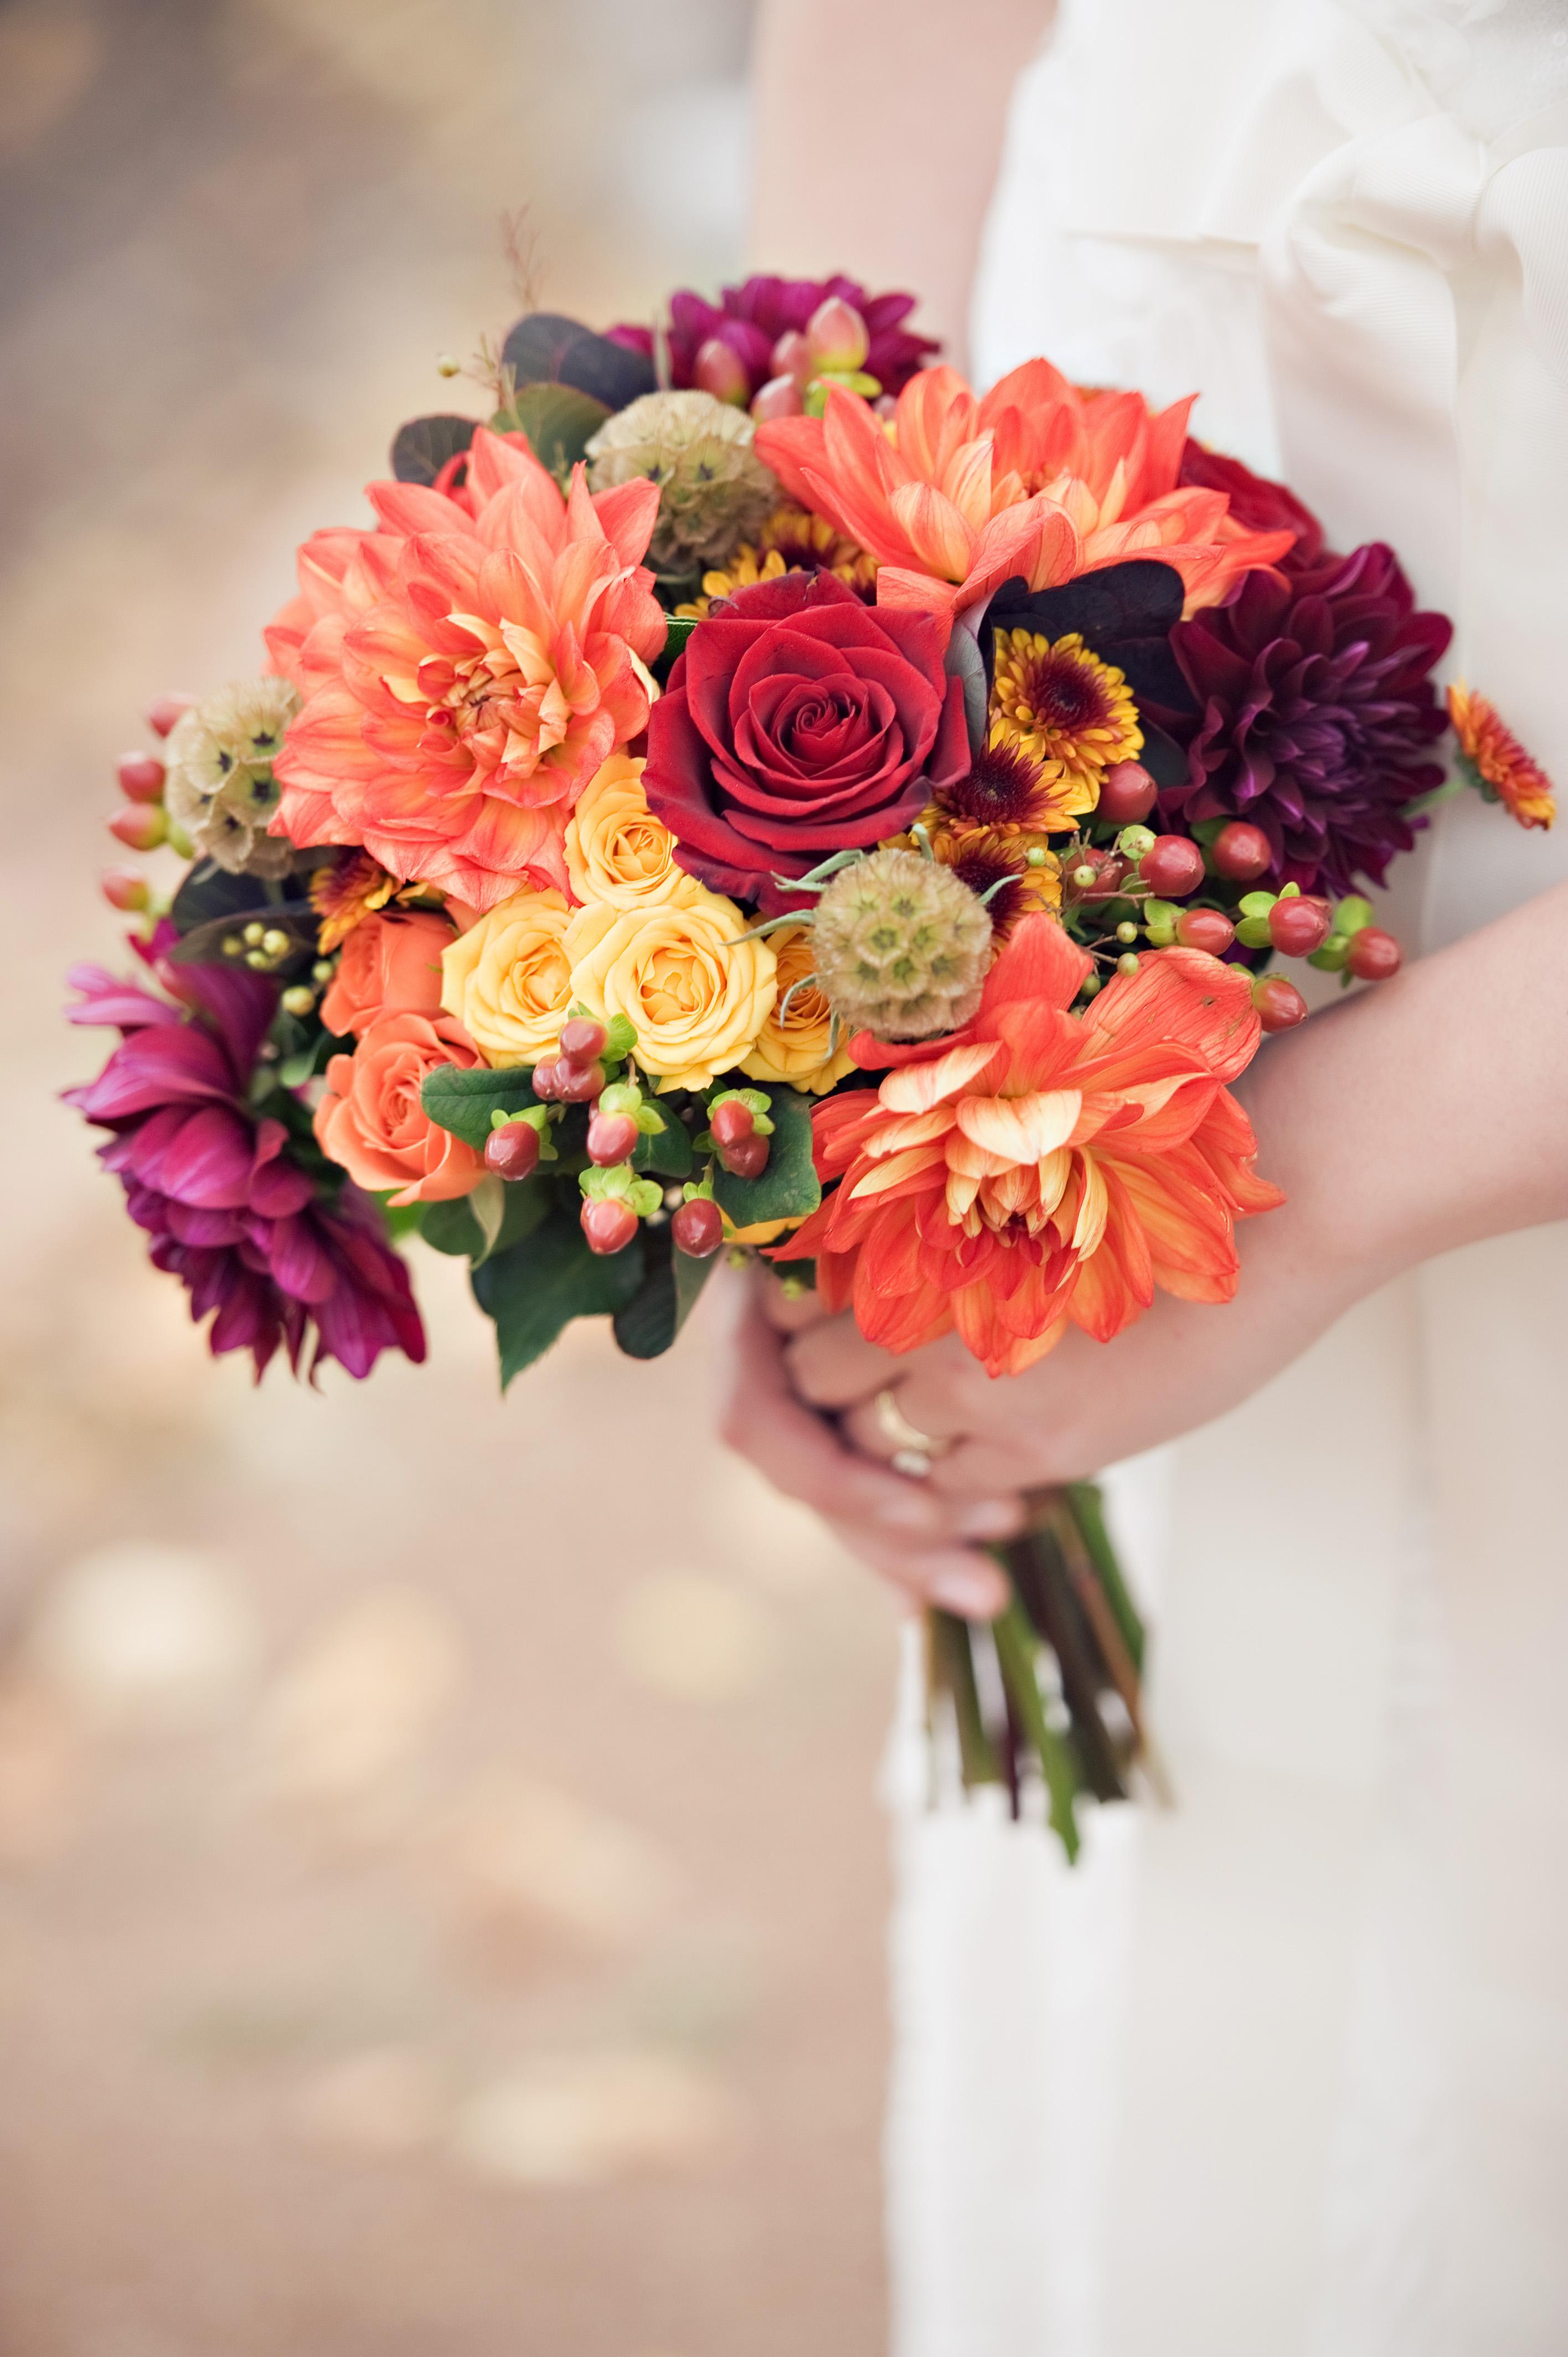 EA Vicino Floral Design Floral Design